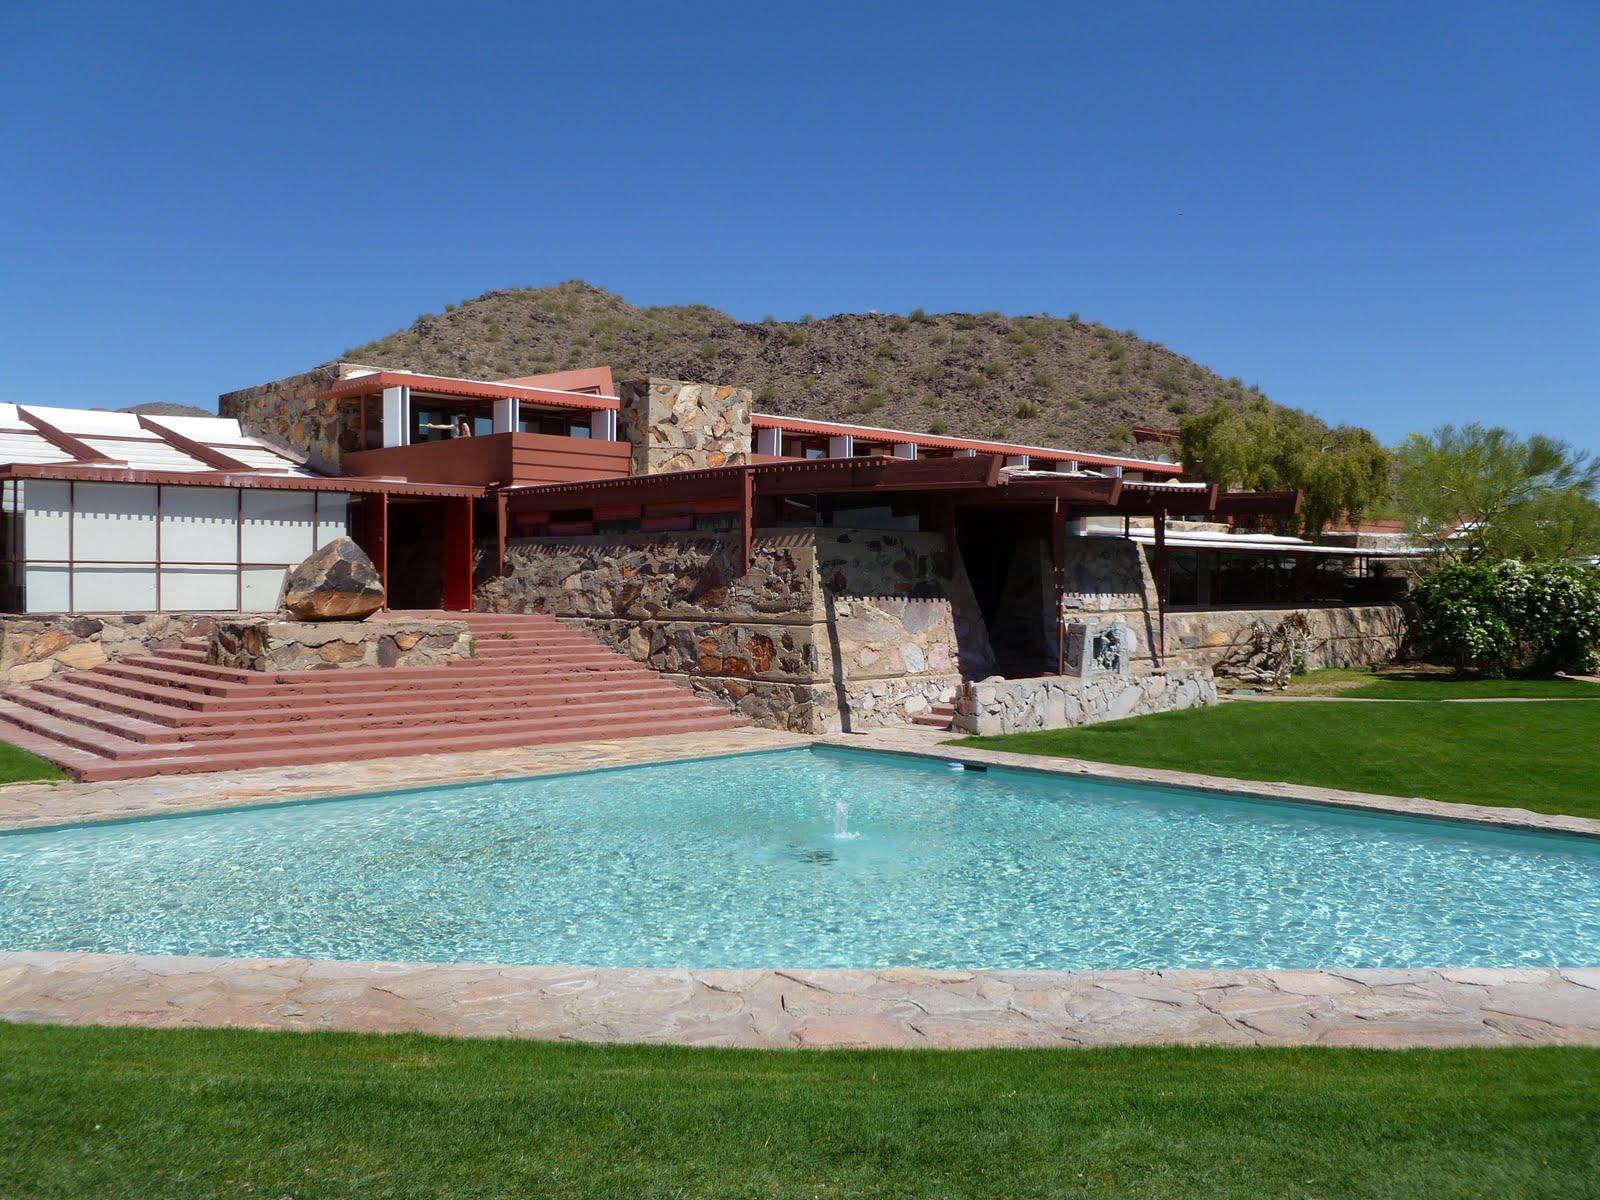 Frank Lloyd Wright Homes Scottsdale - Homemade Ftempo